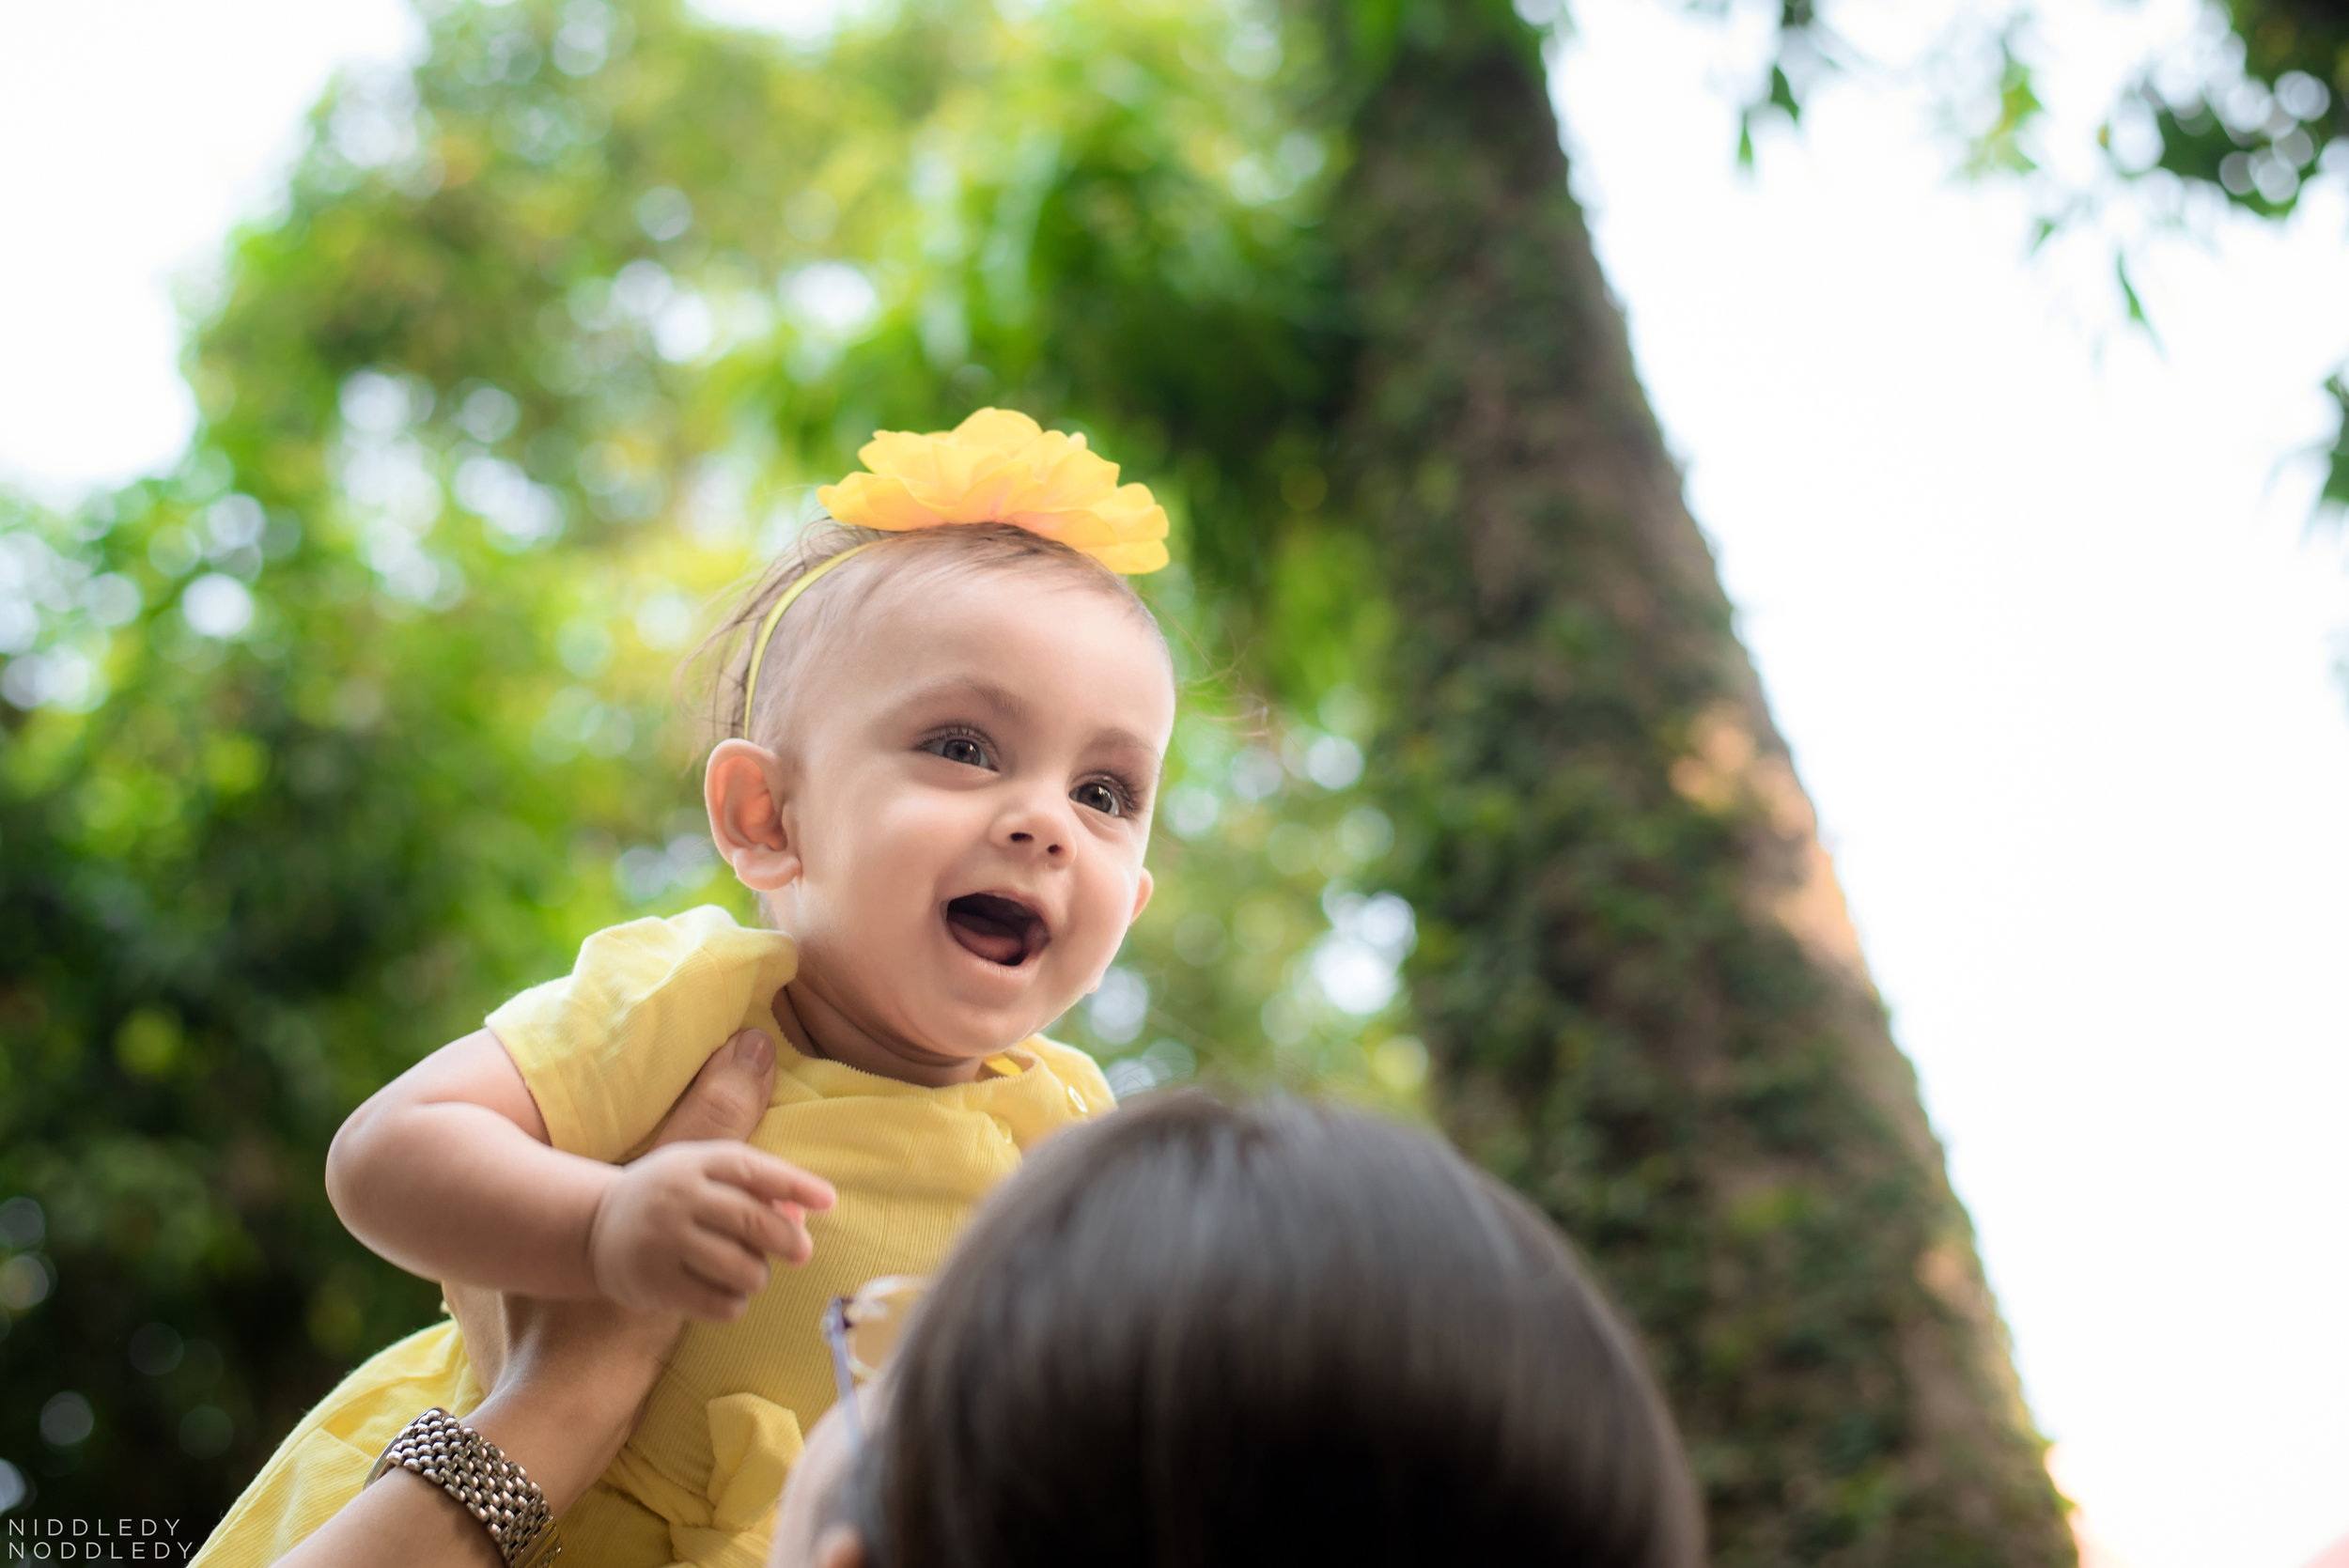 Riddhima Baby Photoshoot ❤ NiddledyNoddledy.com ~ Bumps to Babies Photography, Kolkata - 15.jpg